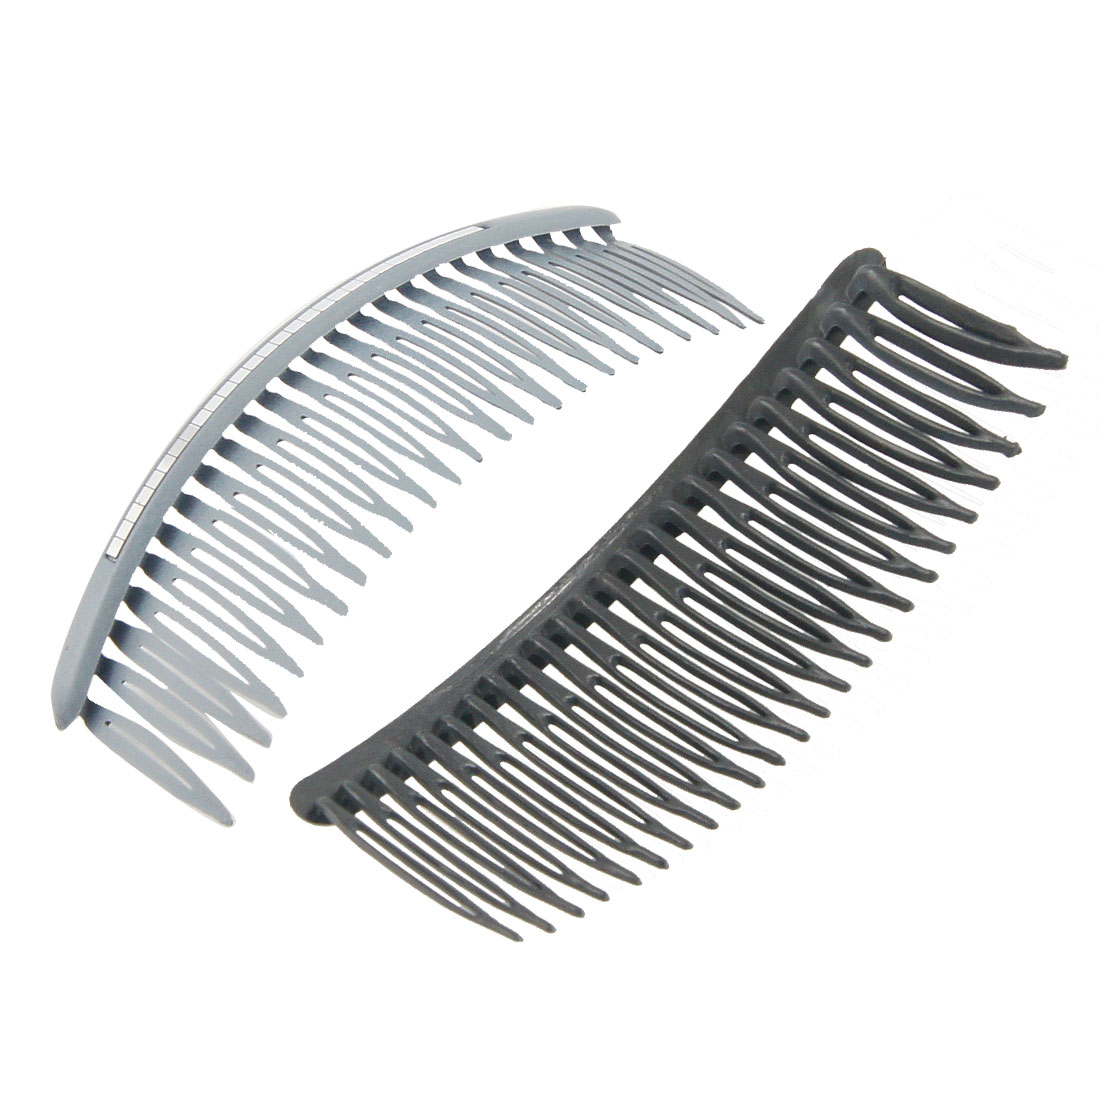 2 Pcs Gray Row Shaped Sheet Inlaid Plastic Comb Hair Pin Clip for Women